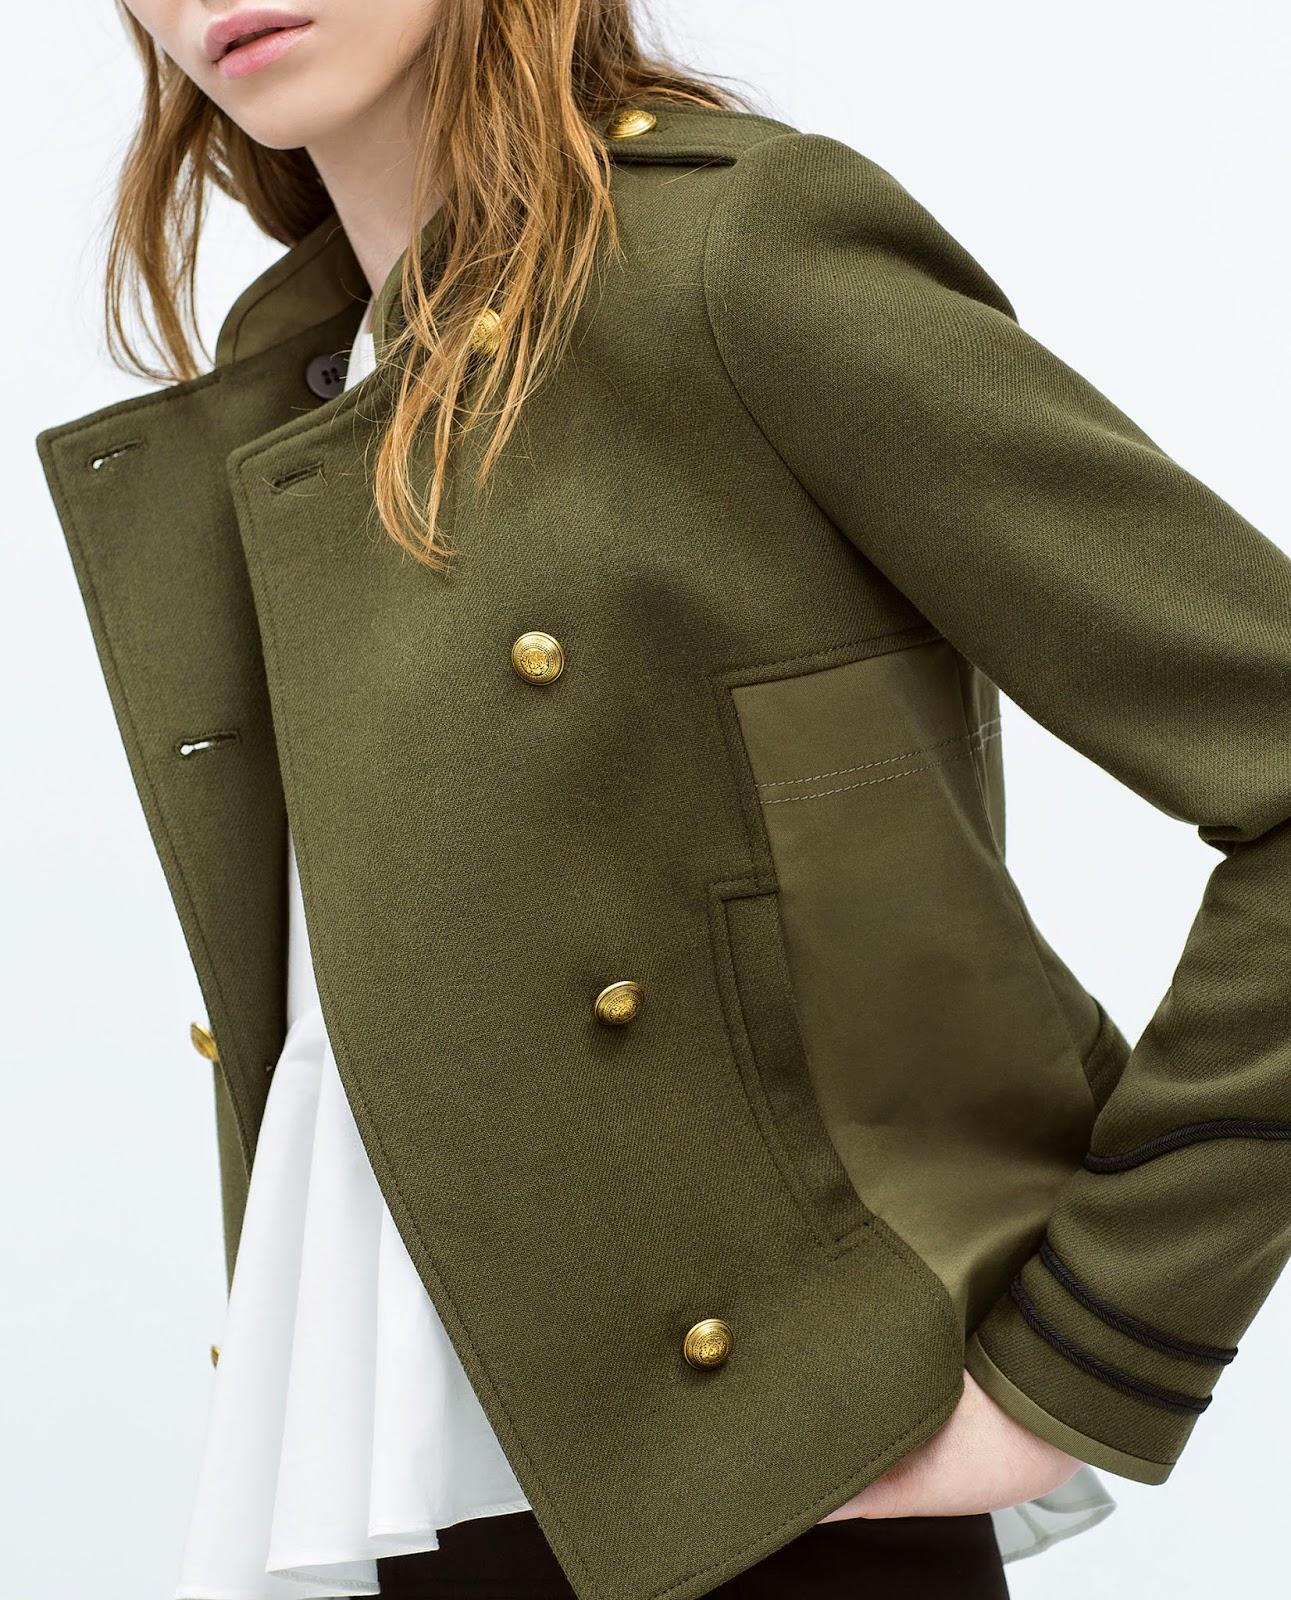 zara khaki jacket, zara military jacket,